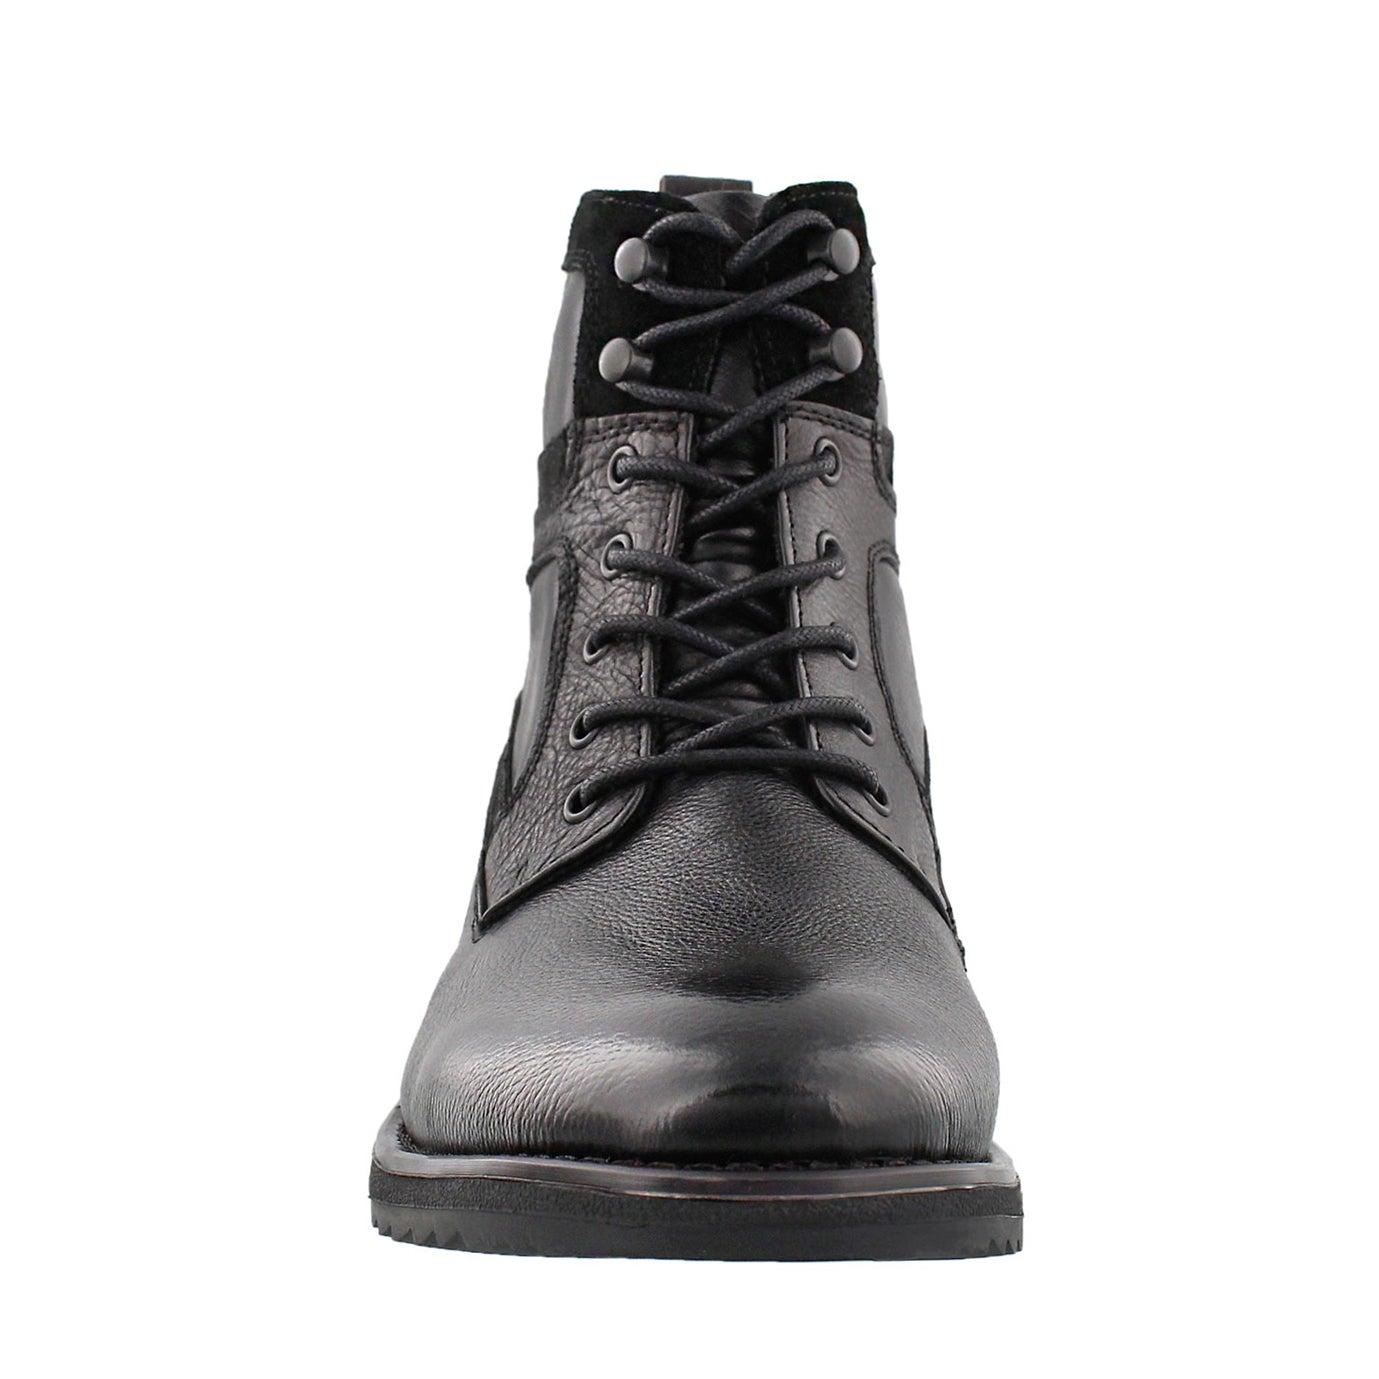 Mns Maldini black leather ankle boot